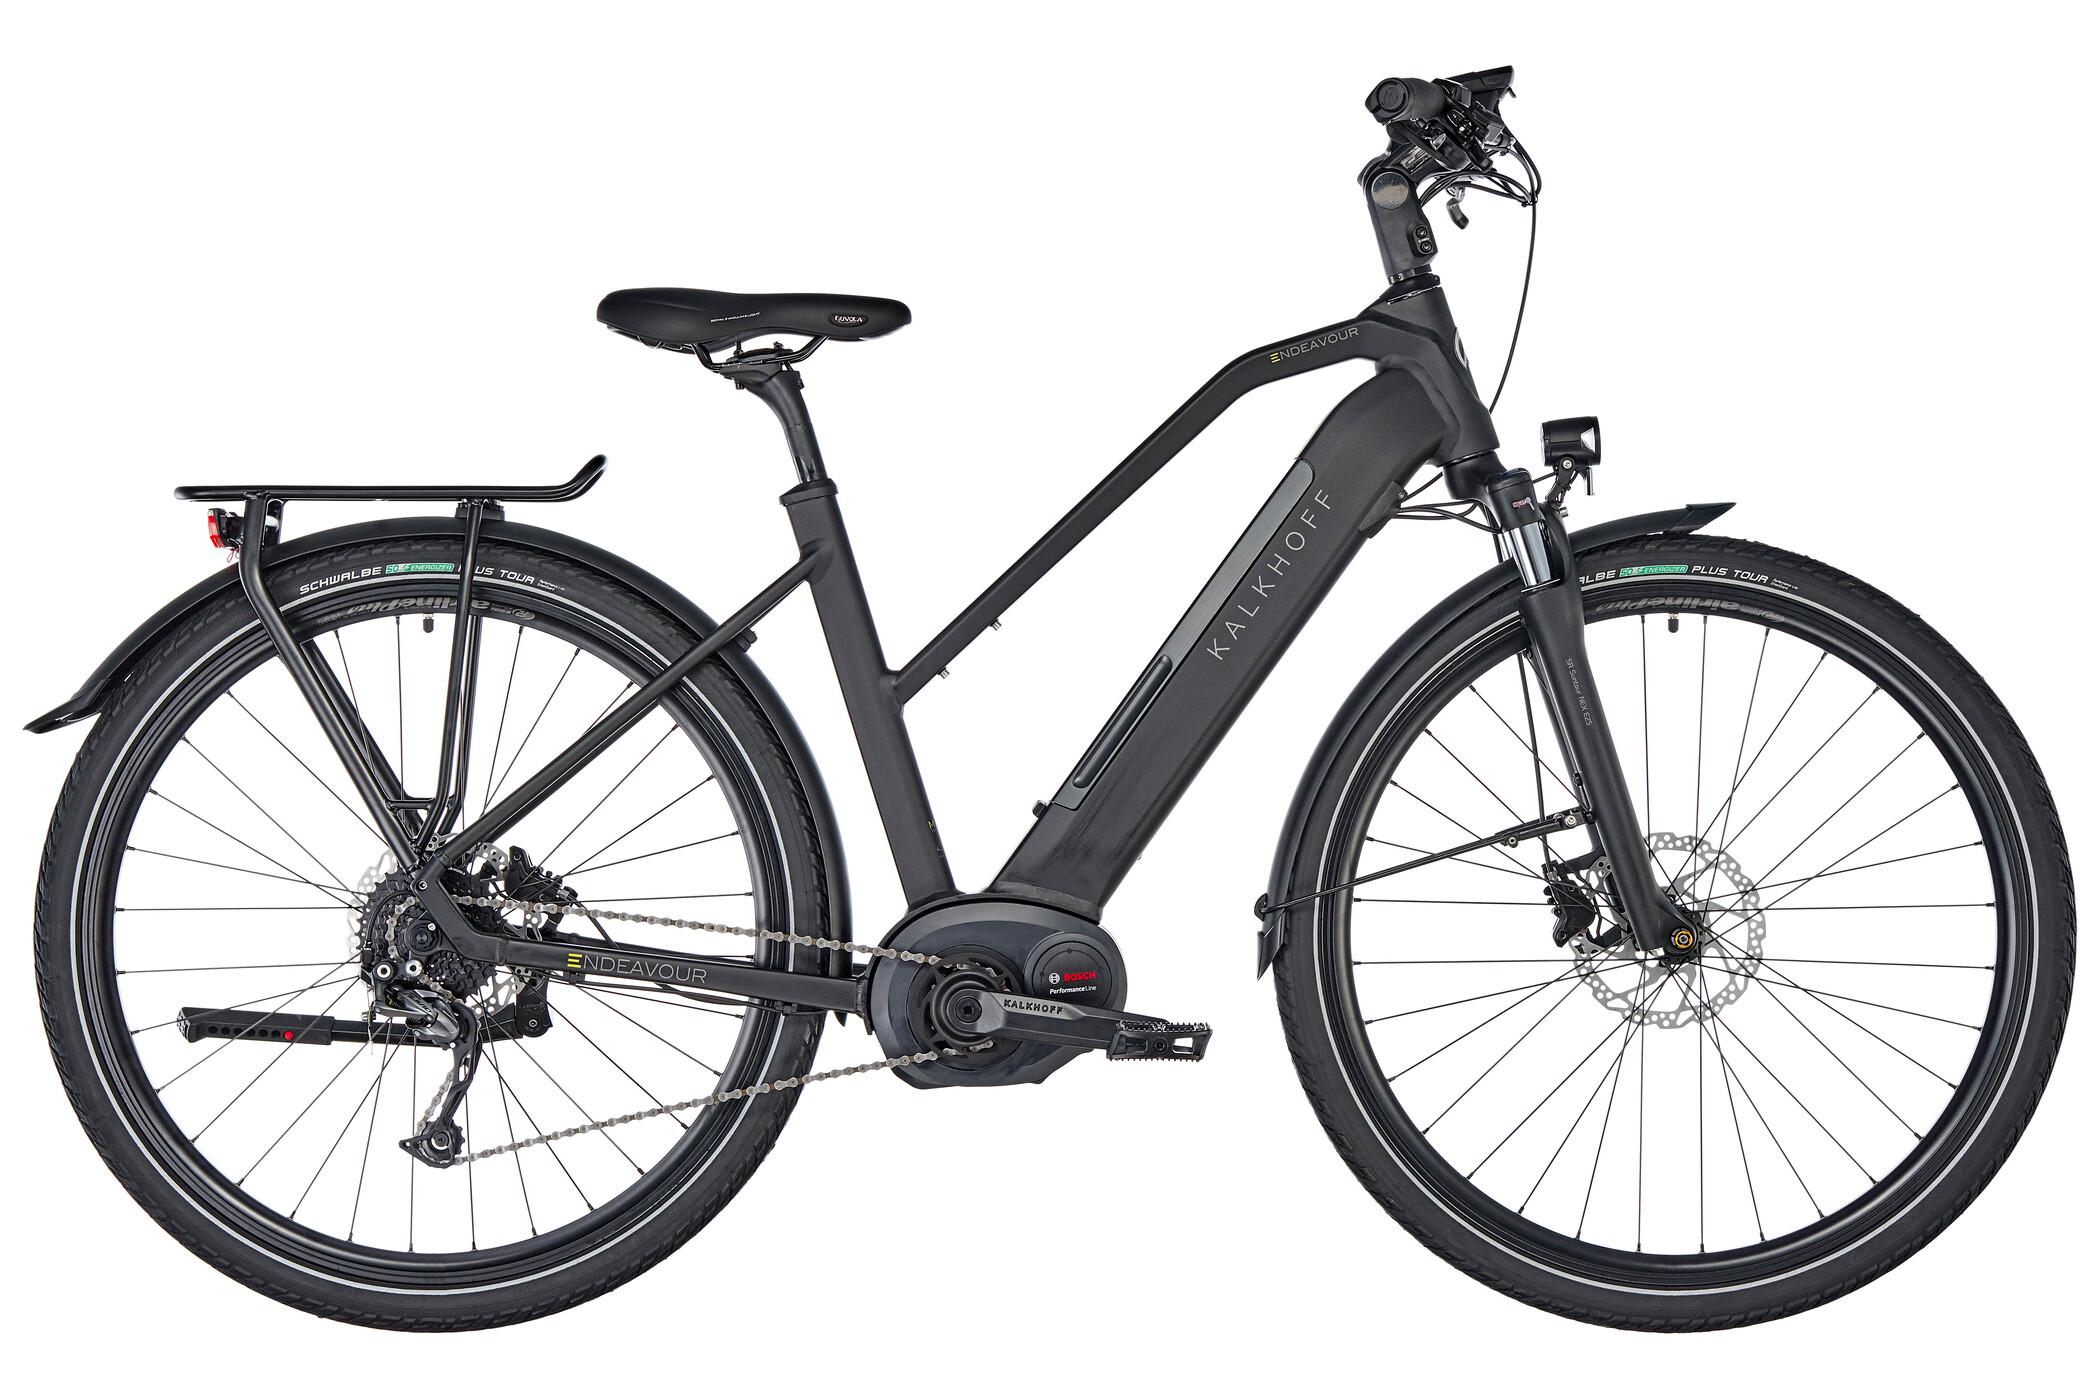 Kalkhoff Endeavour 5.B XXL E-trekkingcykel Trapez 500Wh sort (2019) | City-cykler